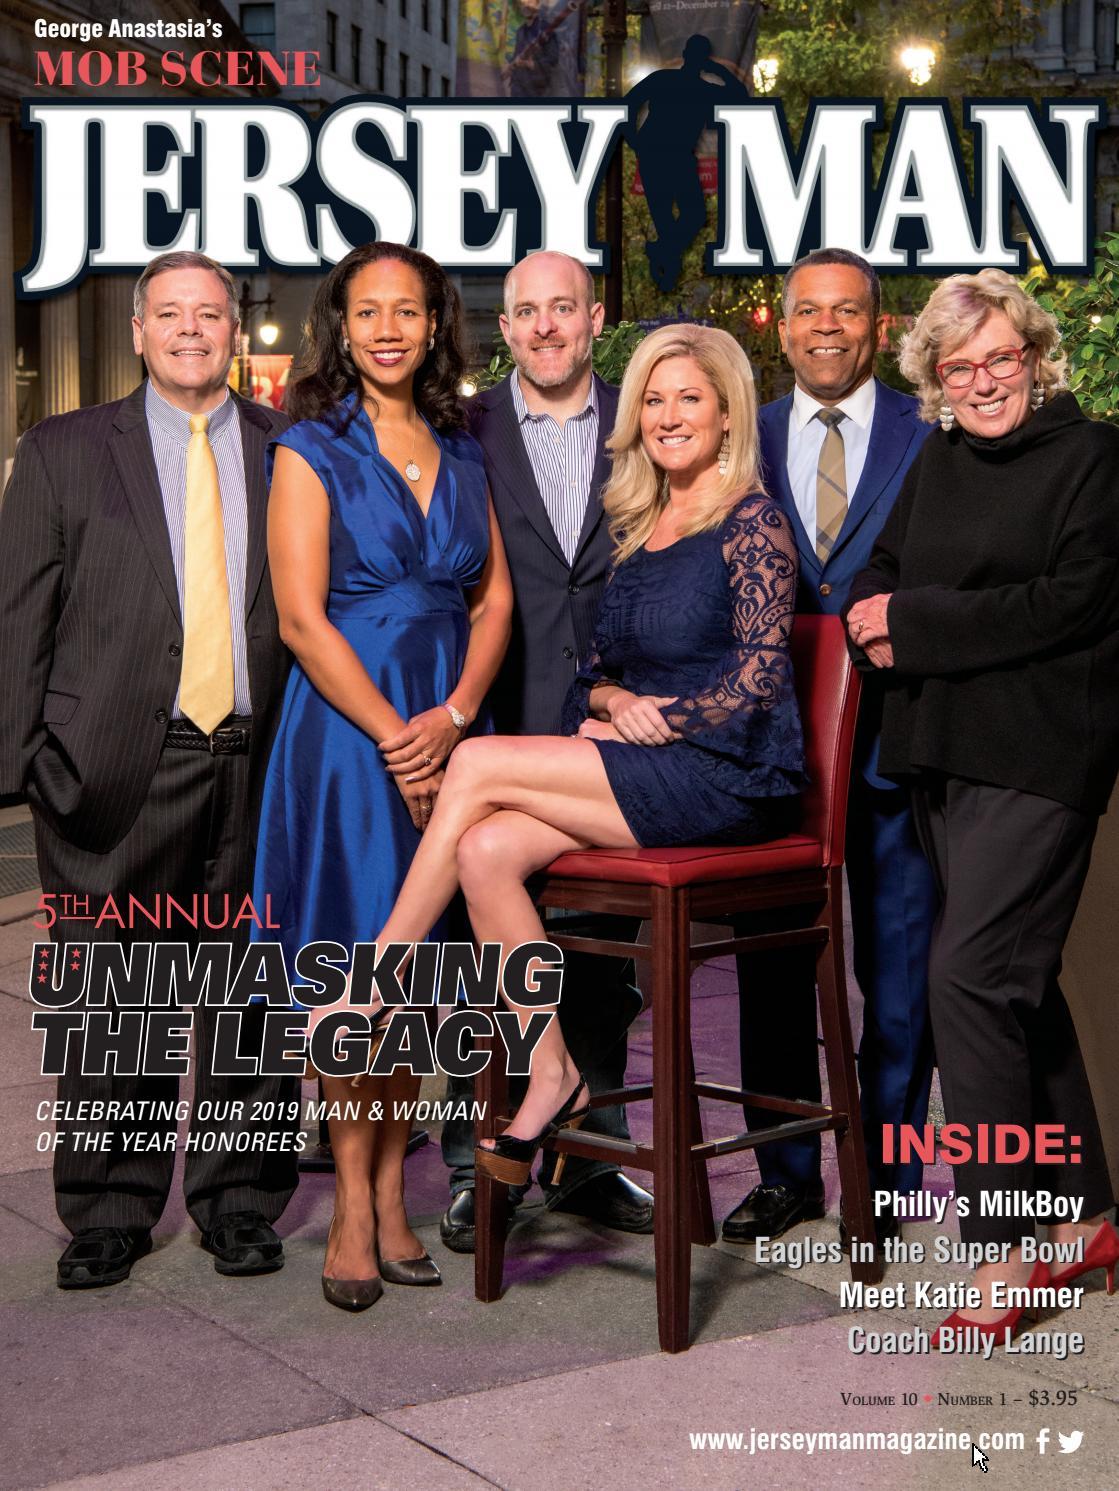 Jerseyman Magazine V10n1 By Jerseymanmagazine Issuu